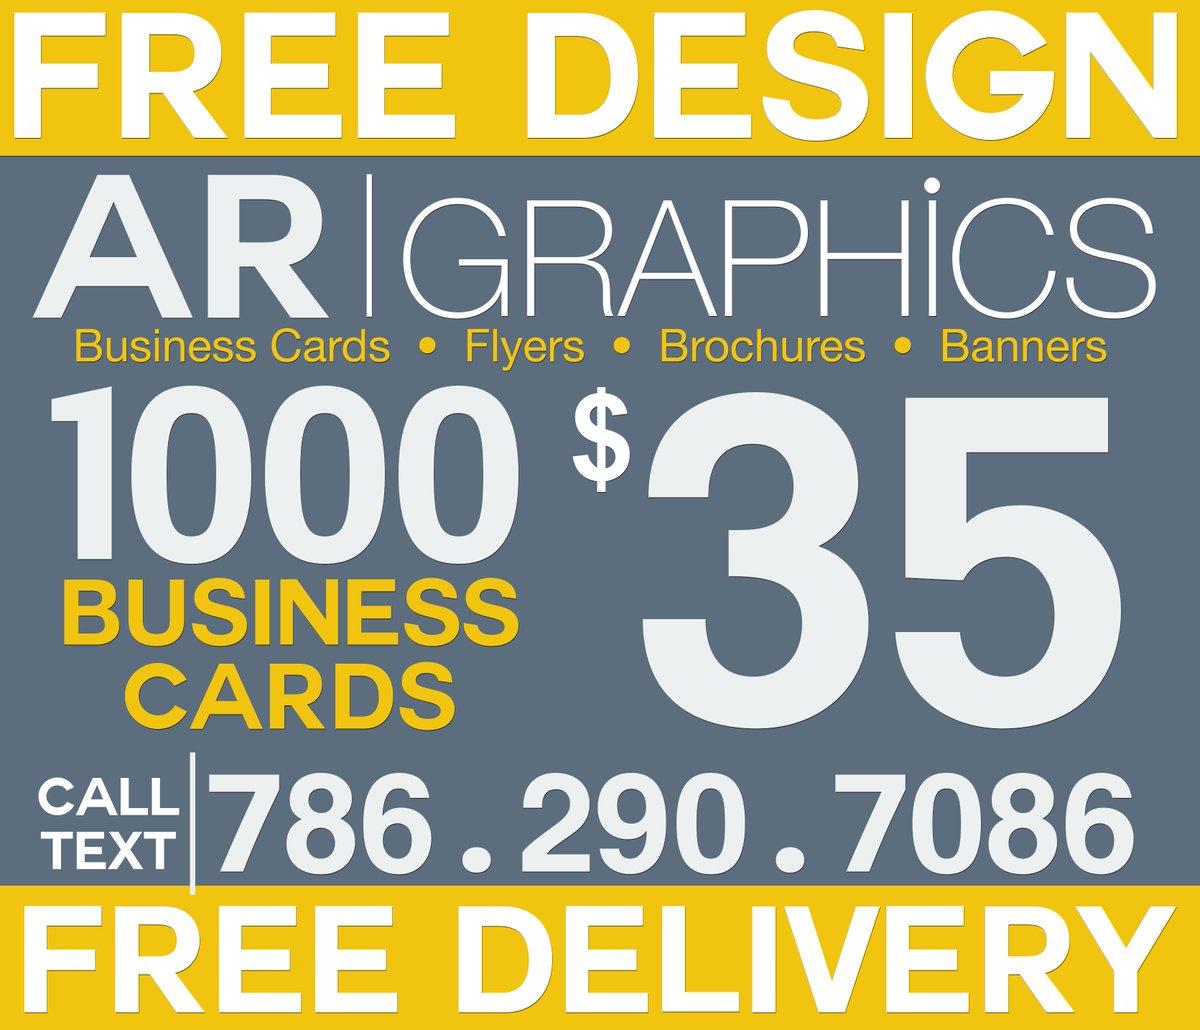 AR Graphics (@ARGraphics21) | Twitter